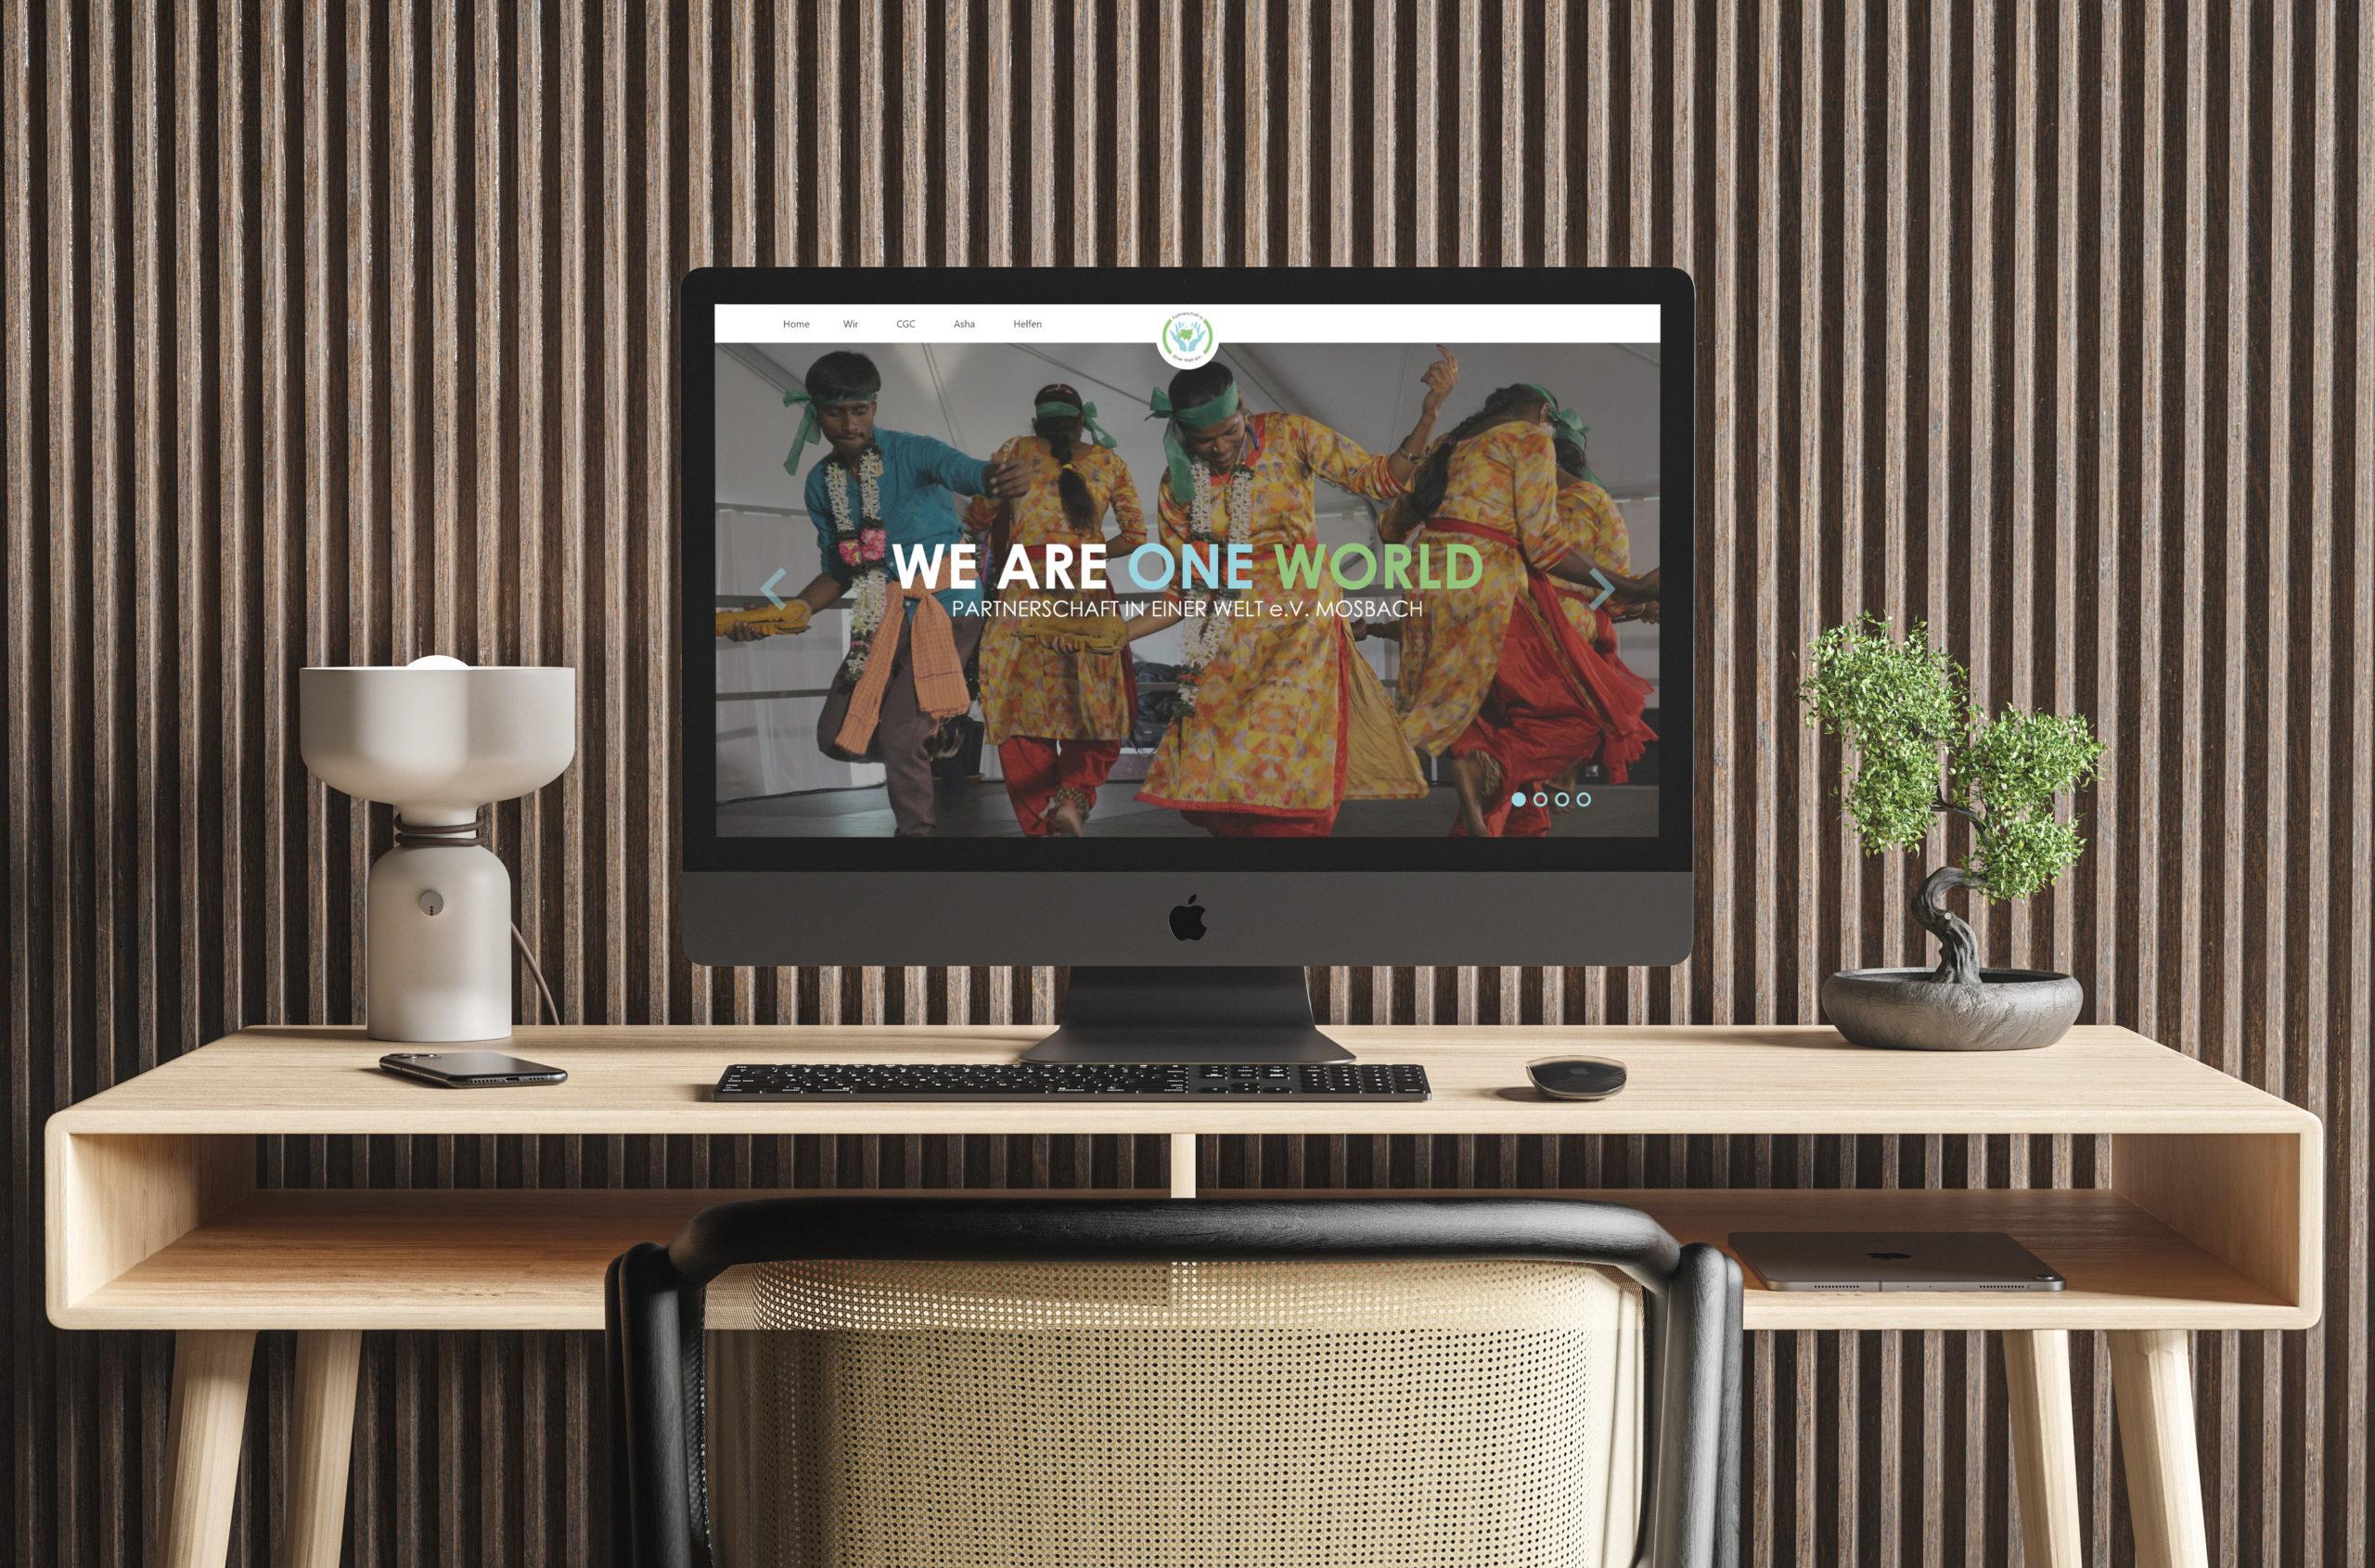 Website Partnerschaft in einer Welt e.V.